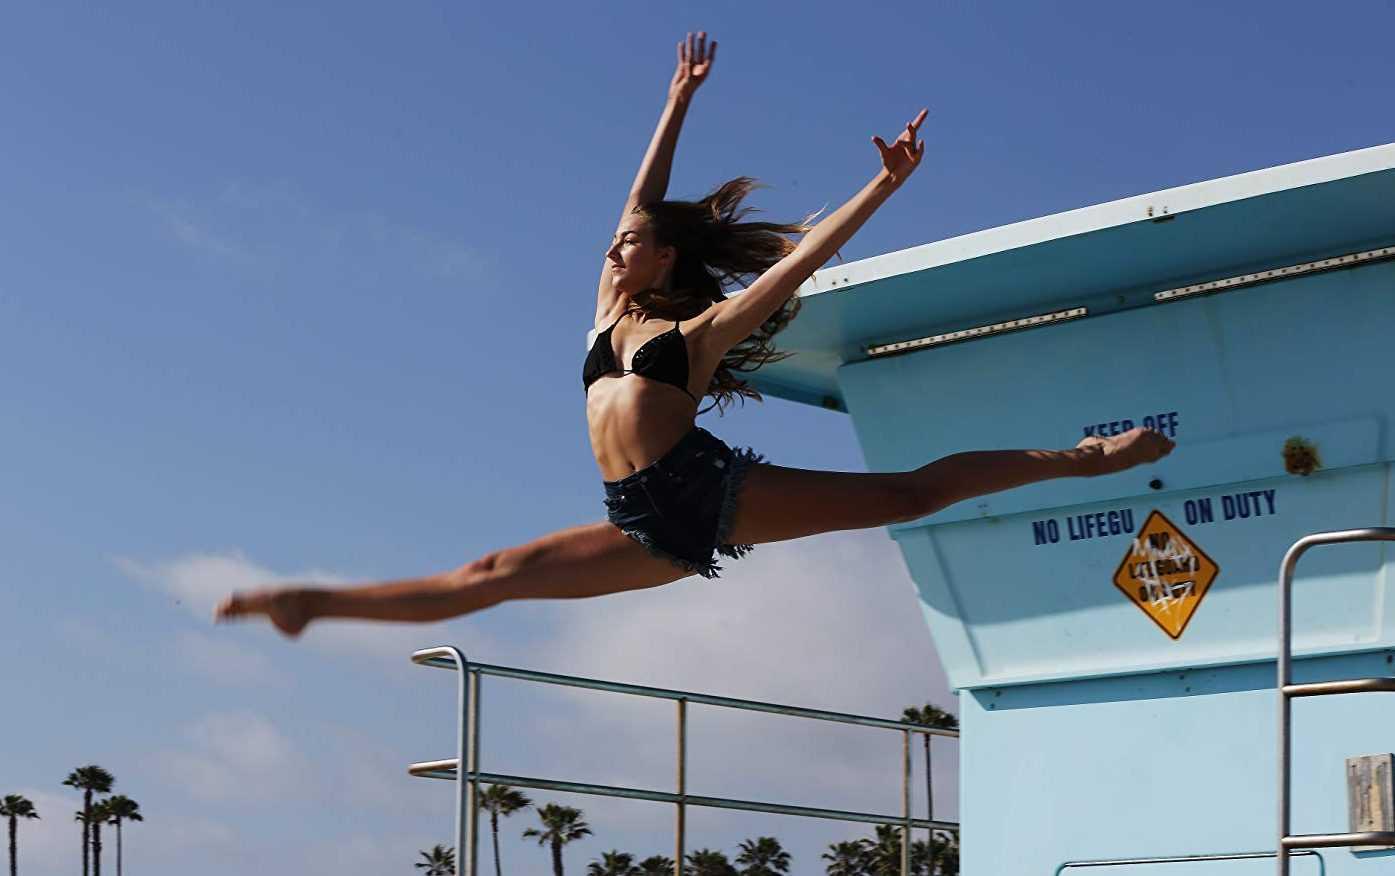 Ava Michelle Dancer